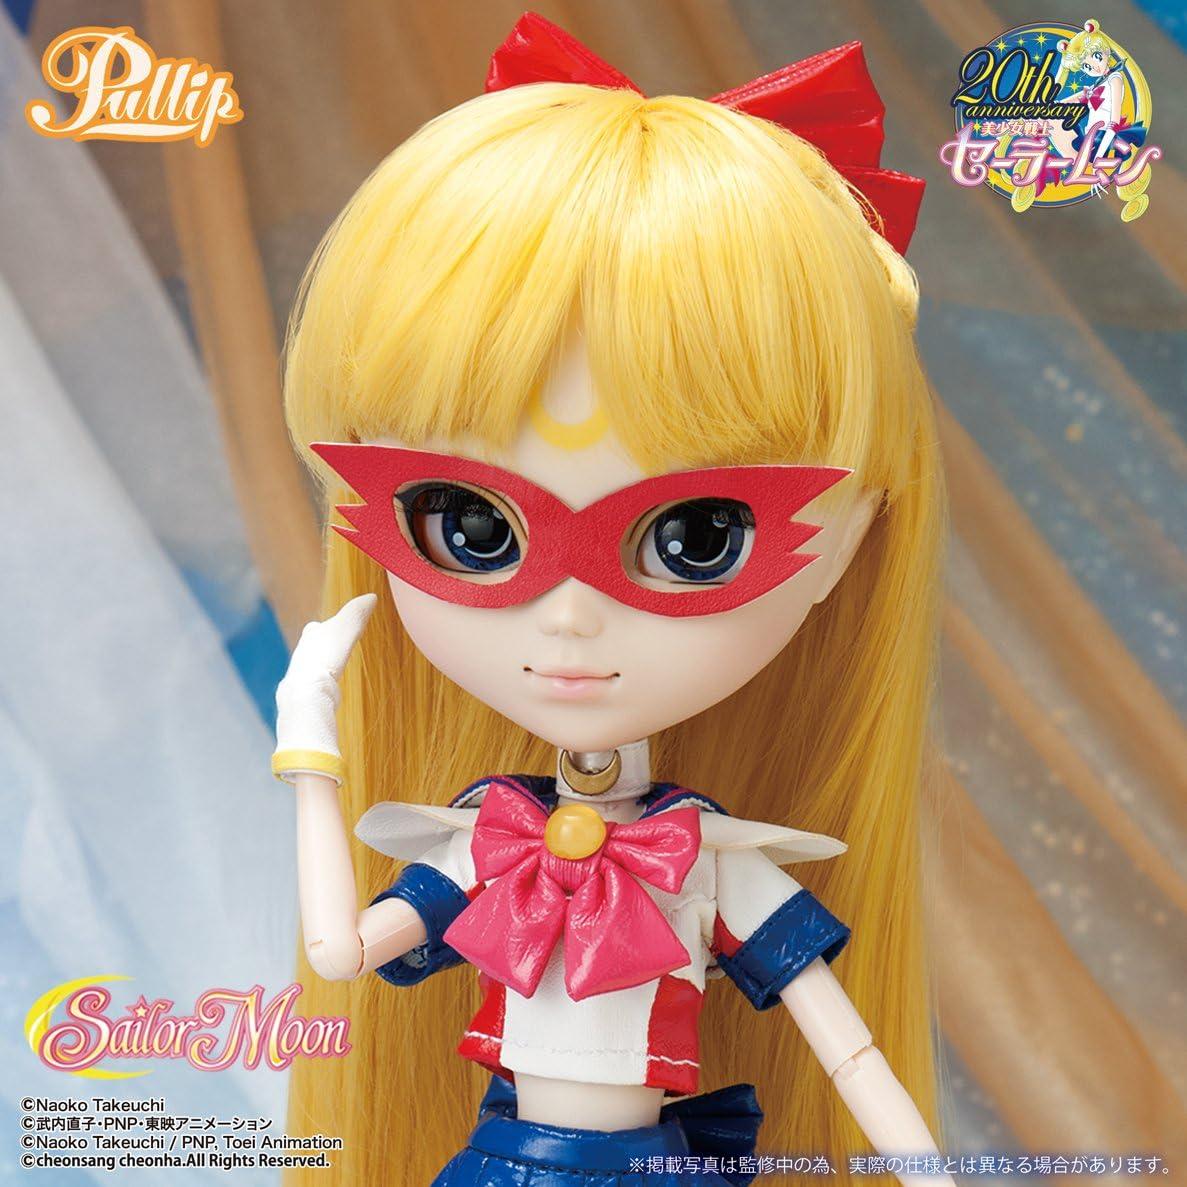 Pullip Sailor Moon Sailor V P-156 Fashion Doll Groove Japan Anime Character